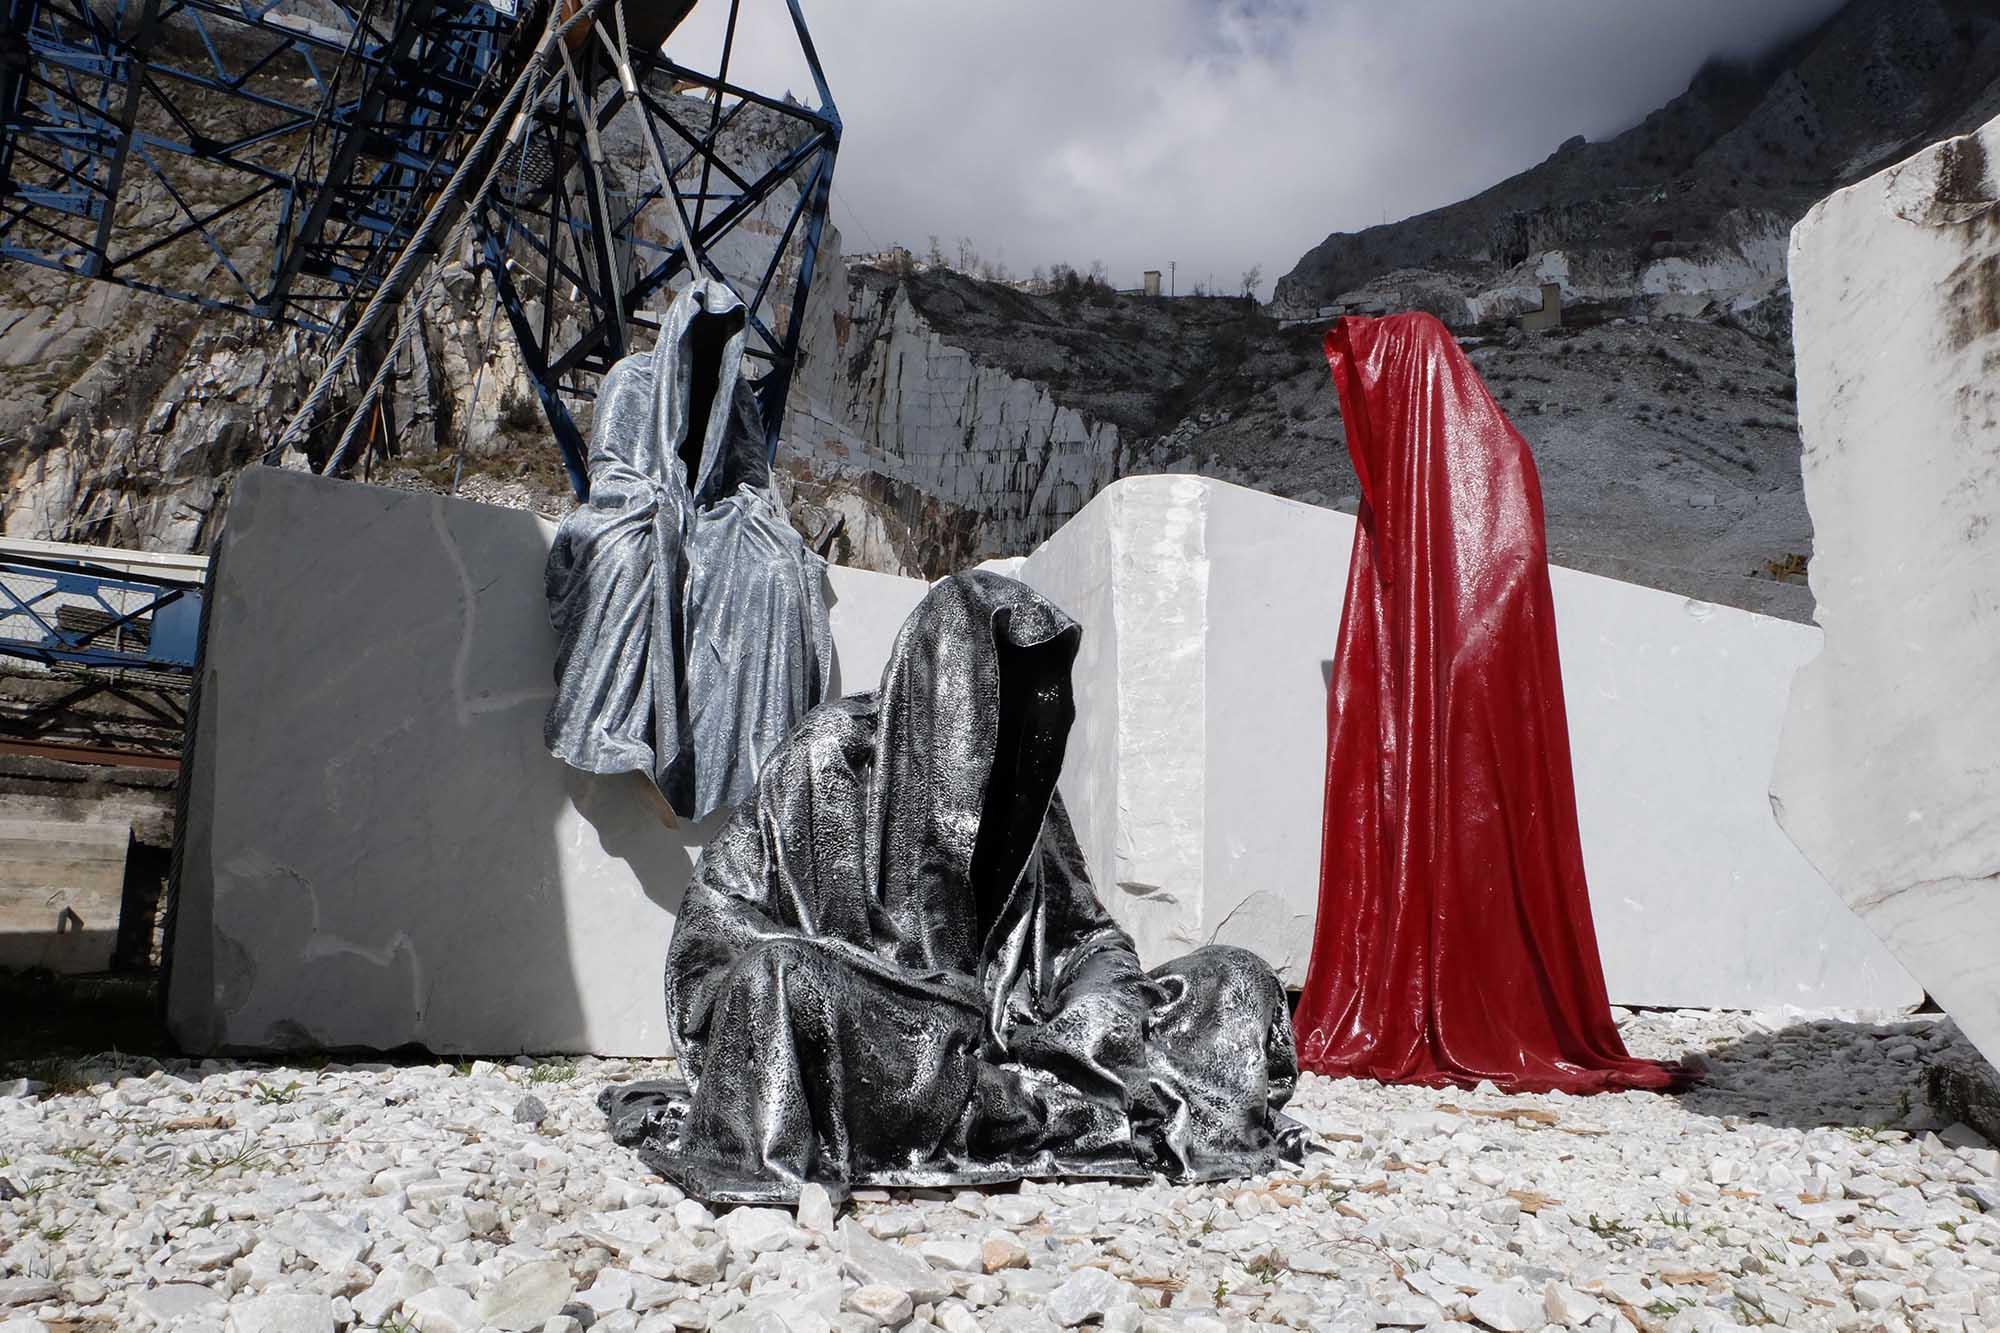 guardians of time manfred kili kielnhofer modern sculpture contemporary fine art design arts statue faceless religion stone marble carrara 0998